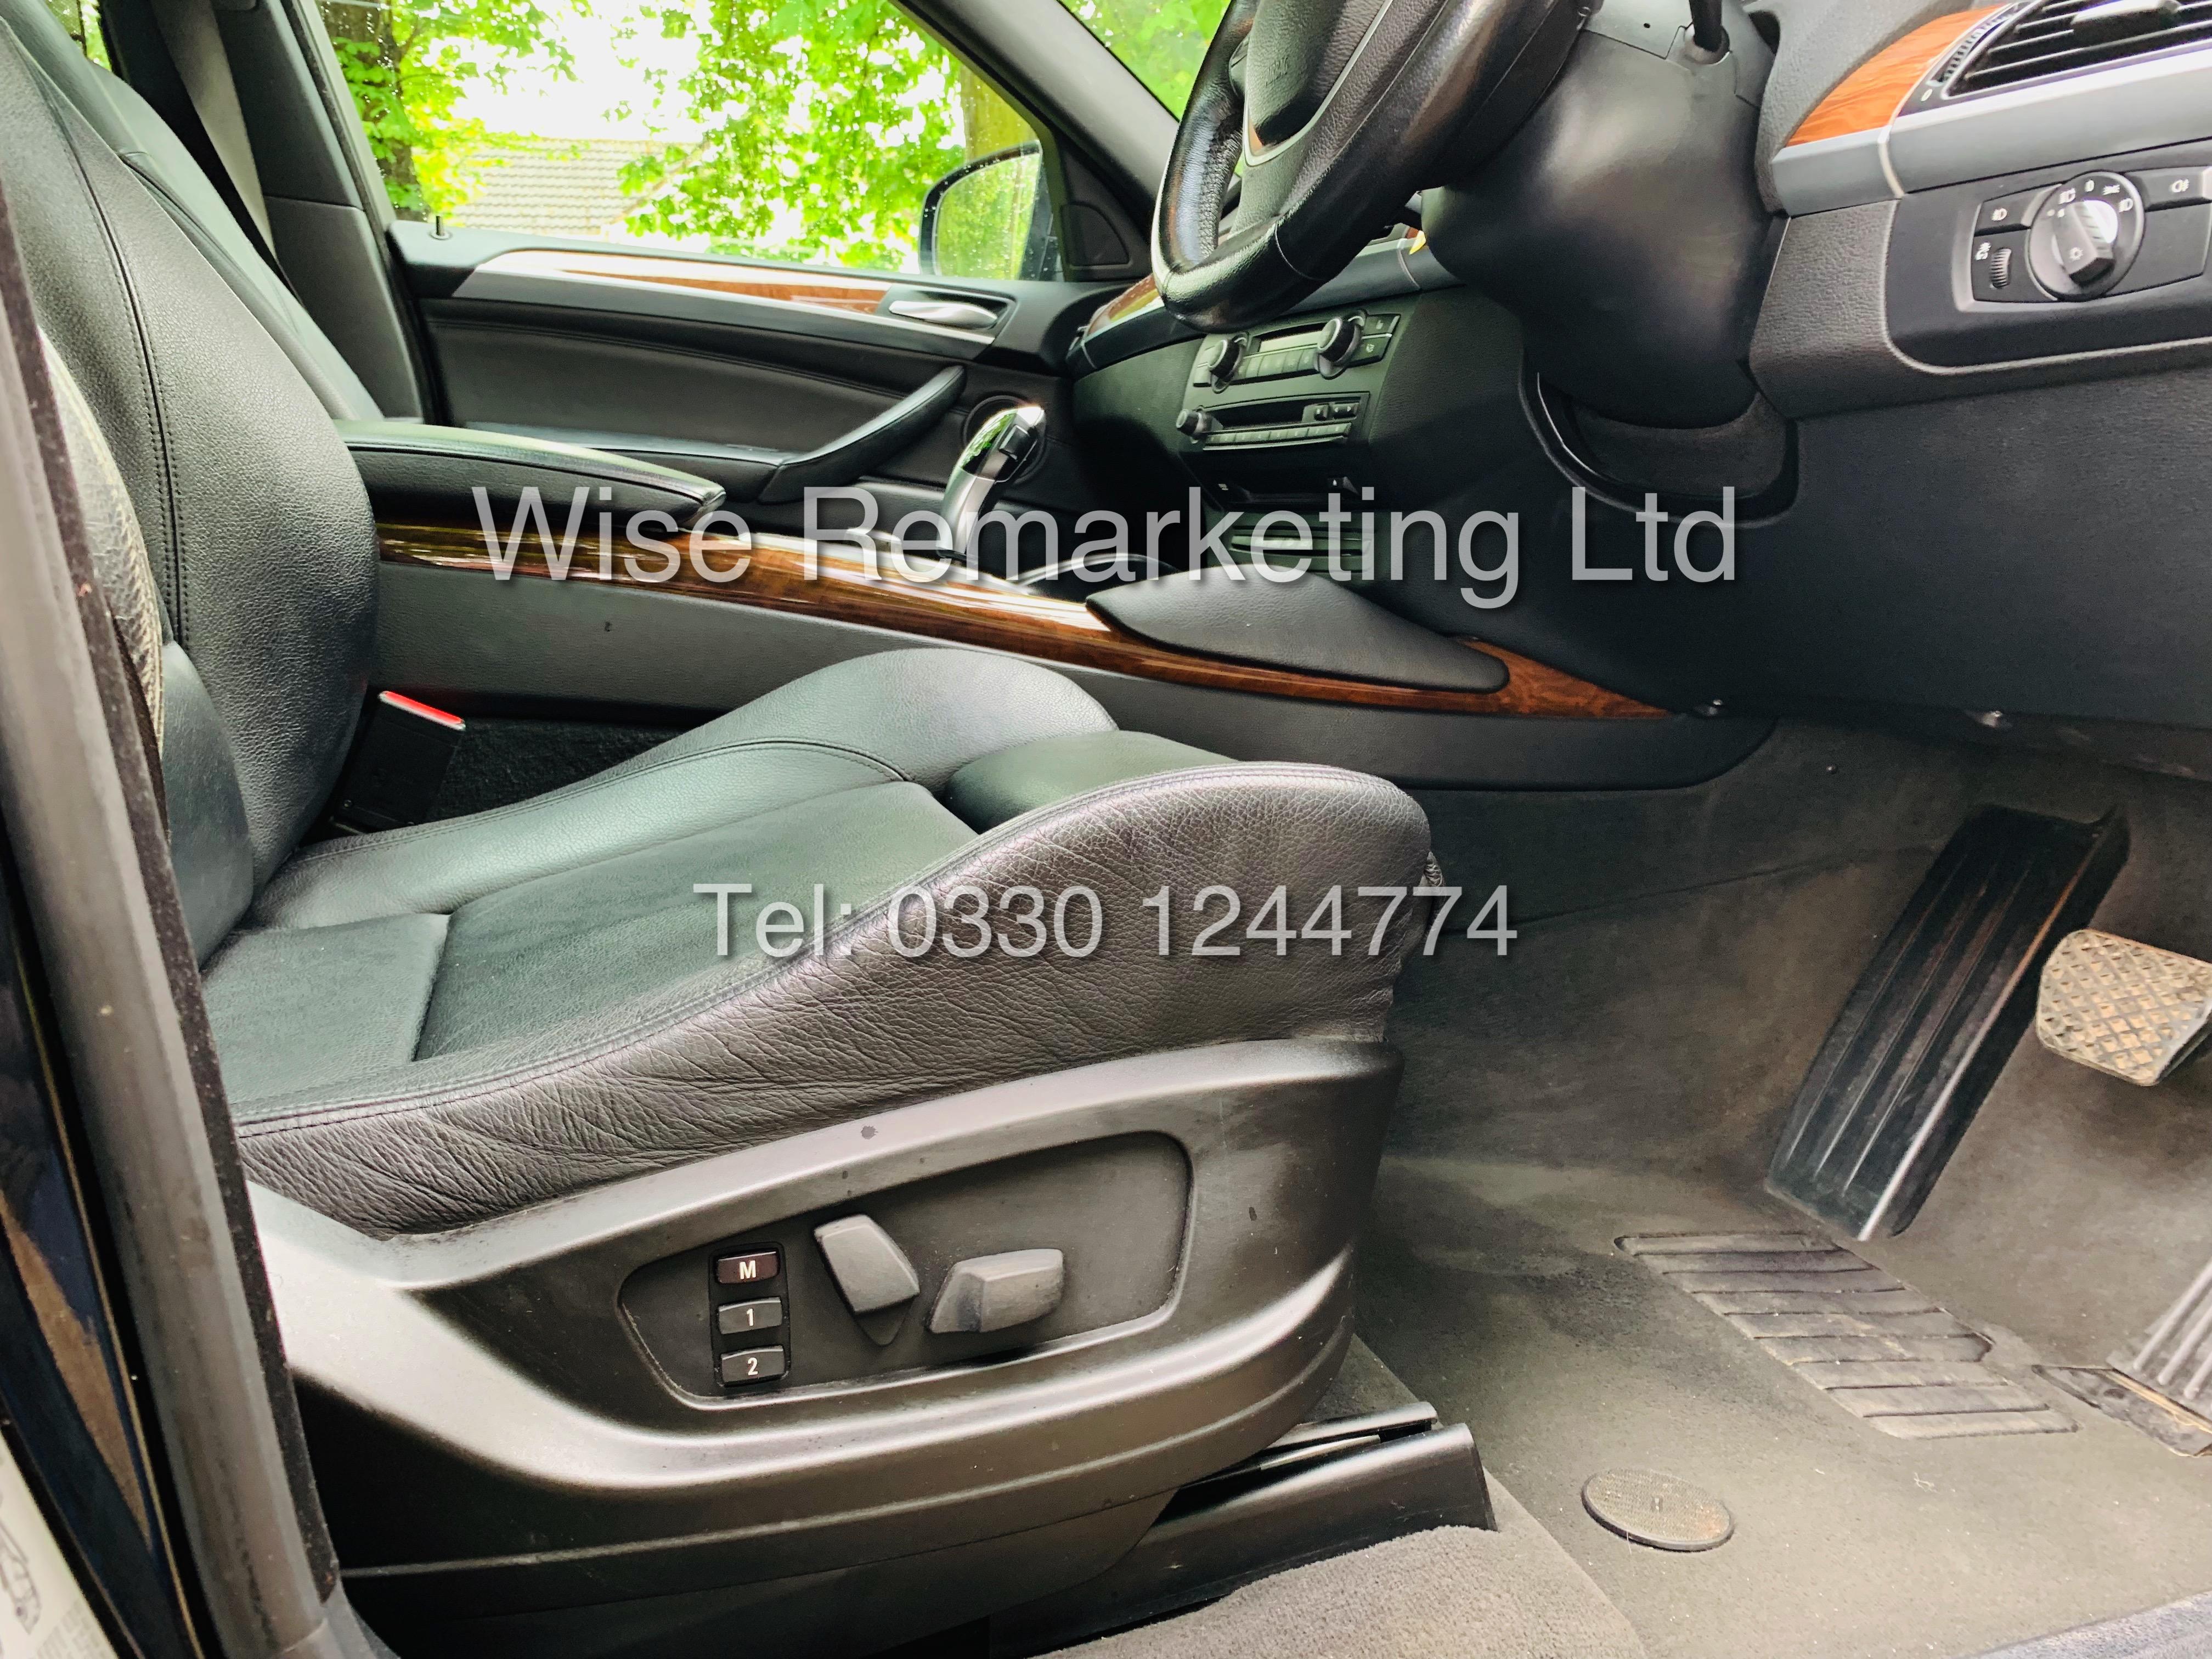 BMW X6 XDRIVE 35D AUTO (2009 SPEC) *1 PREVIOUS OWNER* PARKING AID - SAT NAV - FSH - Image 18 of 25